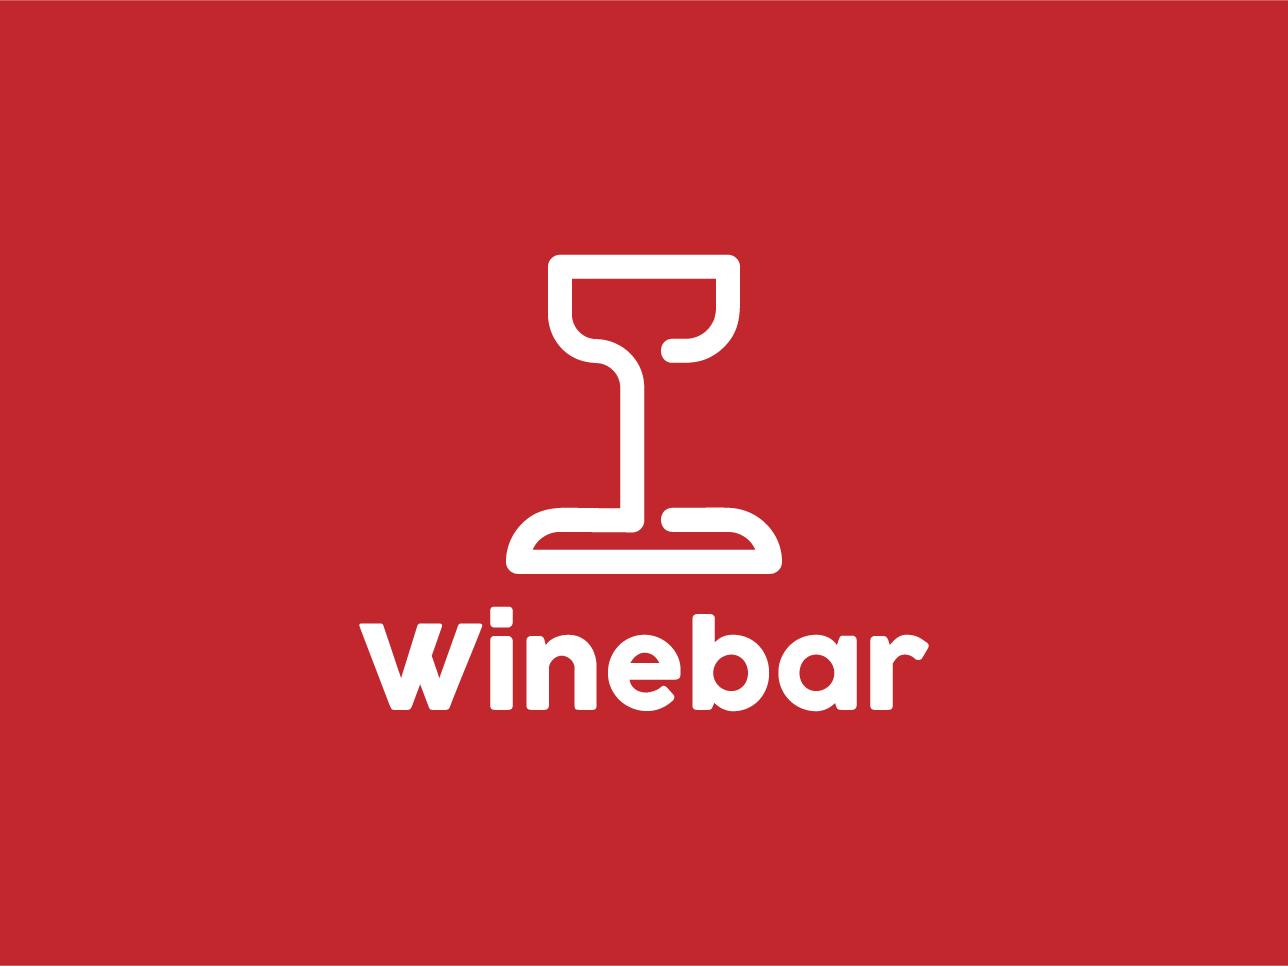 Winebar Logo clean design logo 2019 professional minimalist icon vector branding flat bars bar red classy glass wine bottle wine glass wine label winery wine